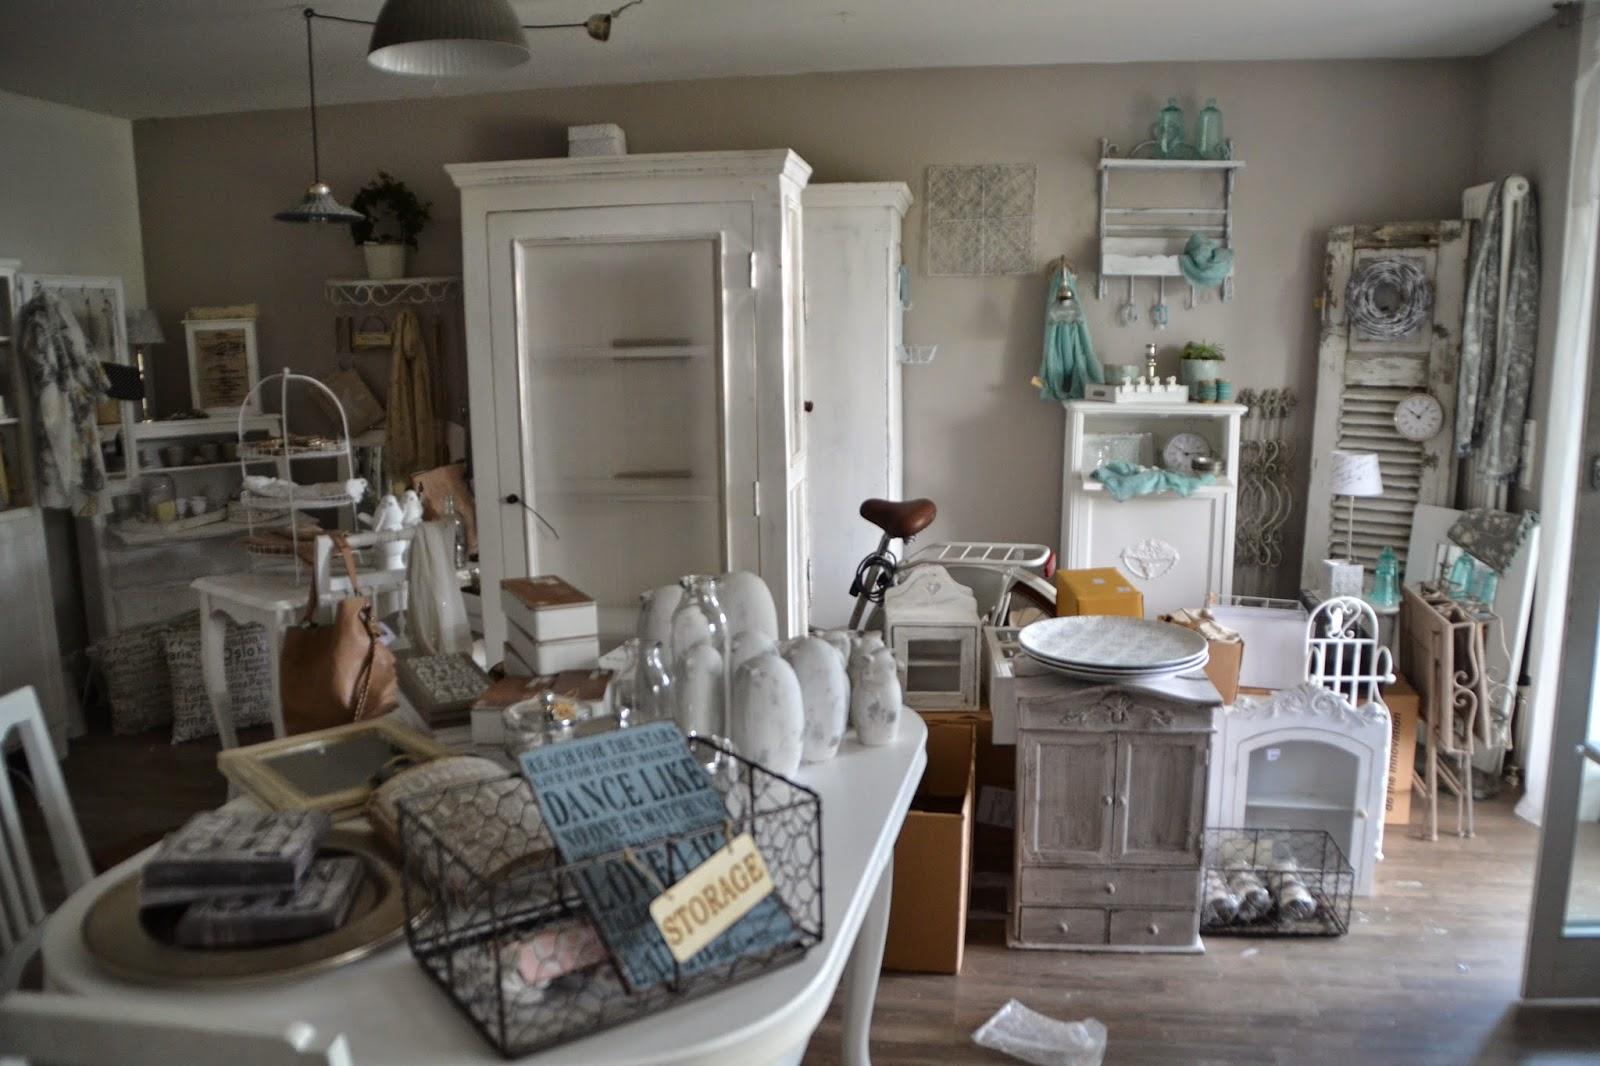 shopping in venlo in den niederlanden kaffee zigaretten dosen angebote. Black Bedroom Furniture Sets. Home Design Ideas